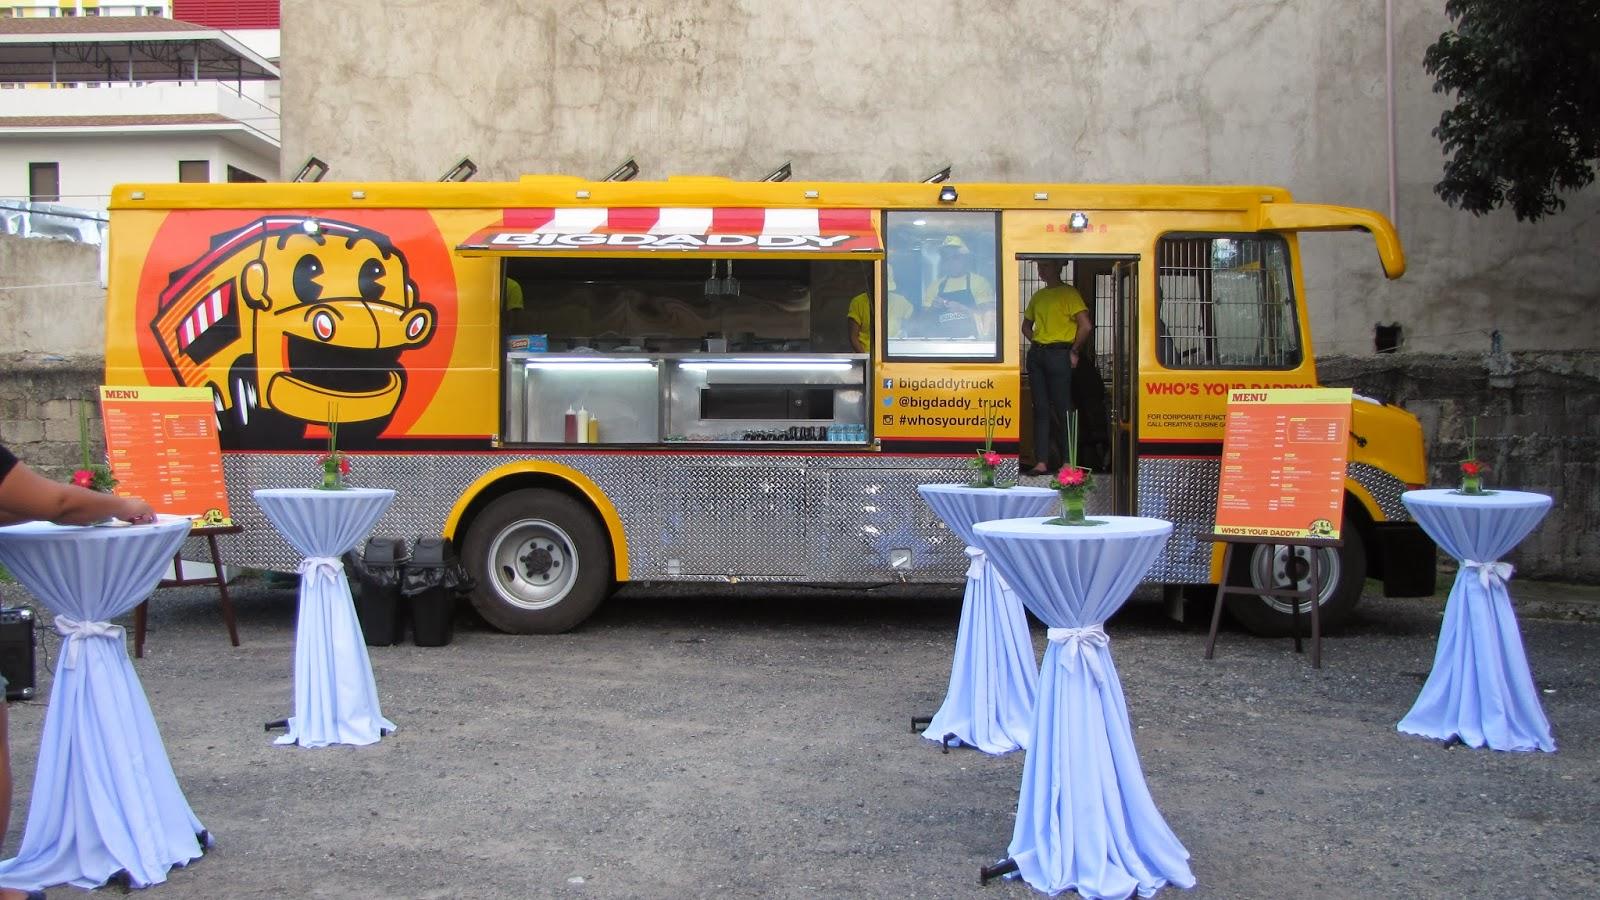 #032eatdrink, food, cebu, cebu food truck, burger